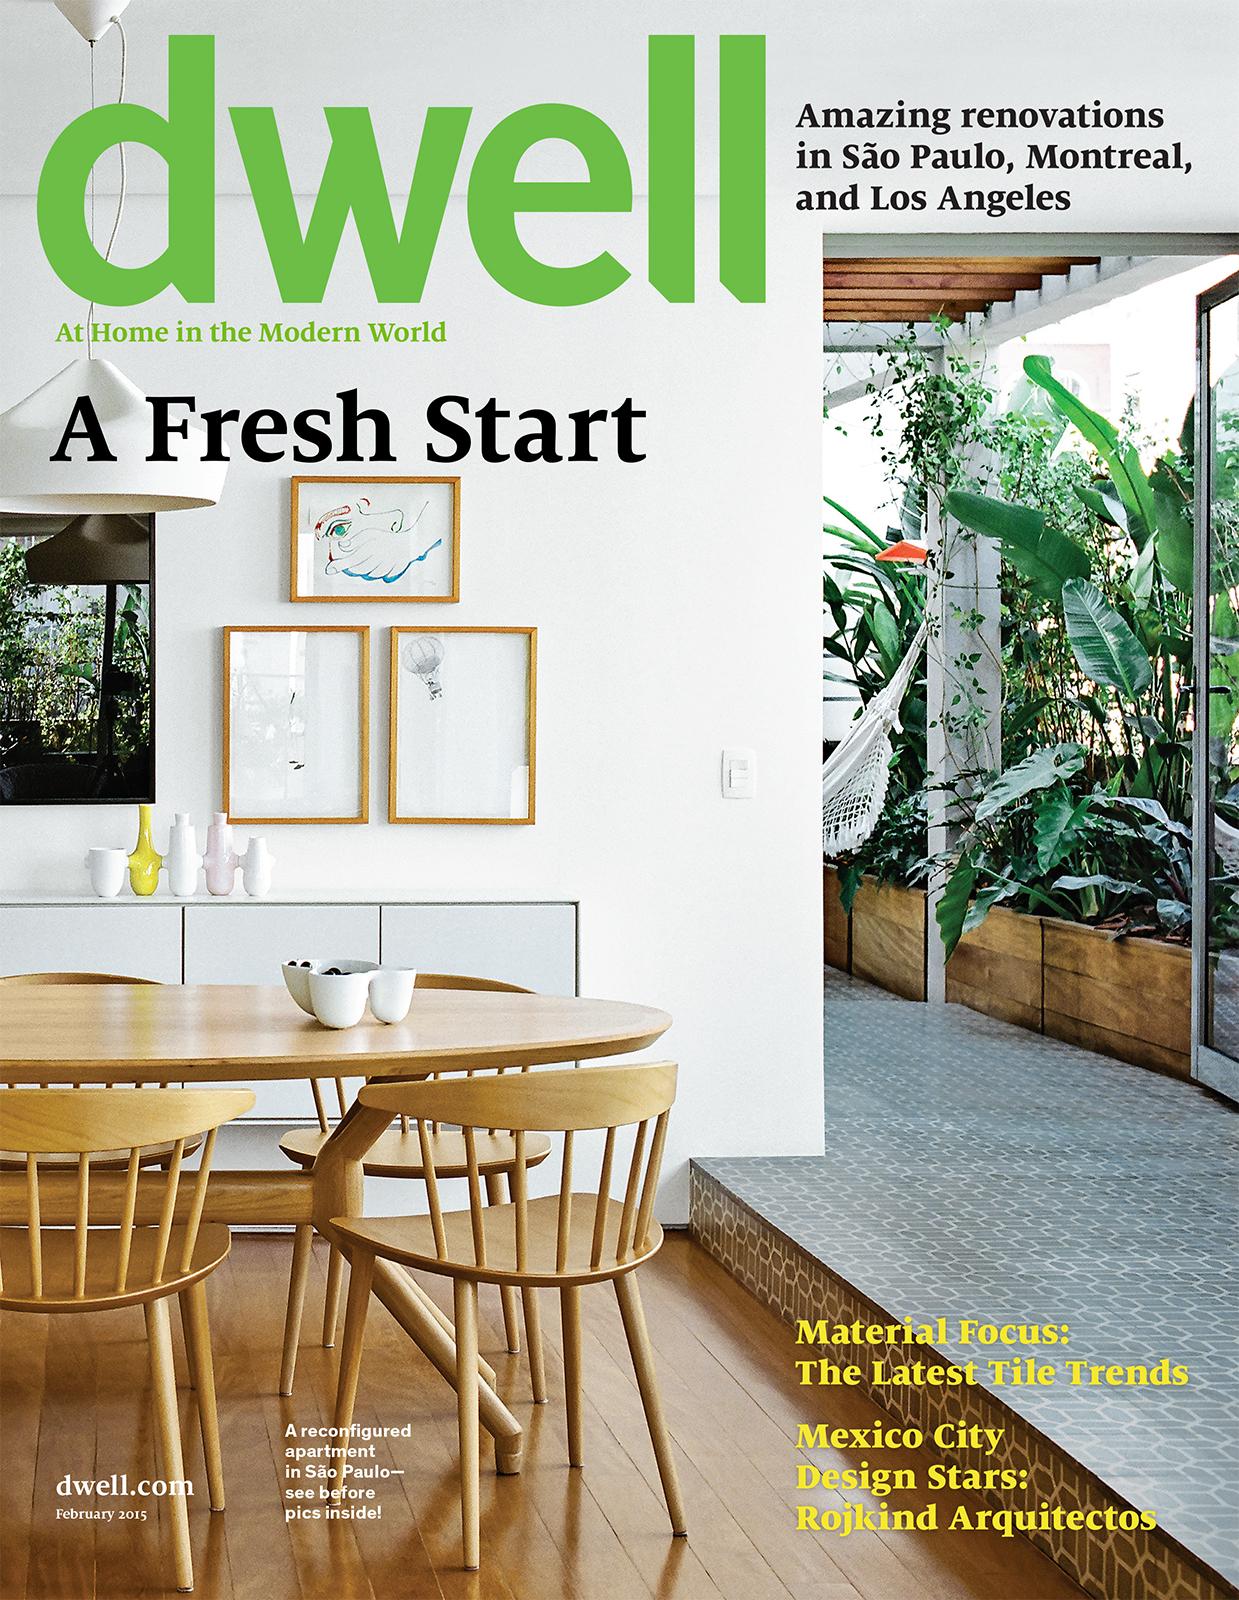 Dwell Showcases a 1920s Austin Bungalow Reno with ANICHINI Linens